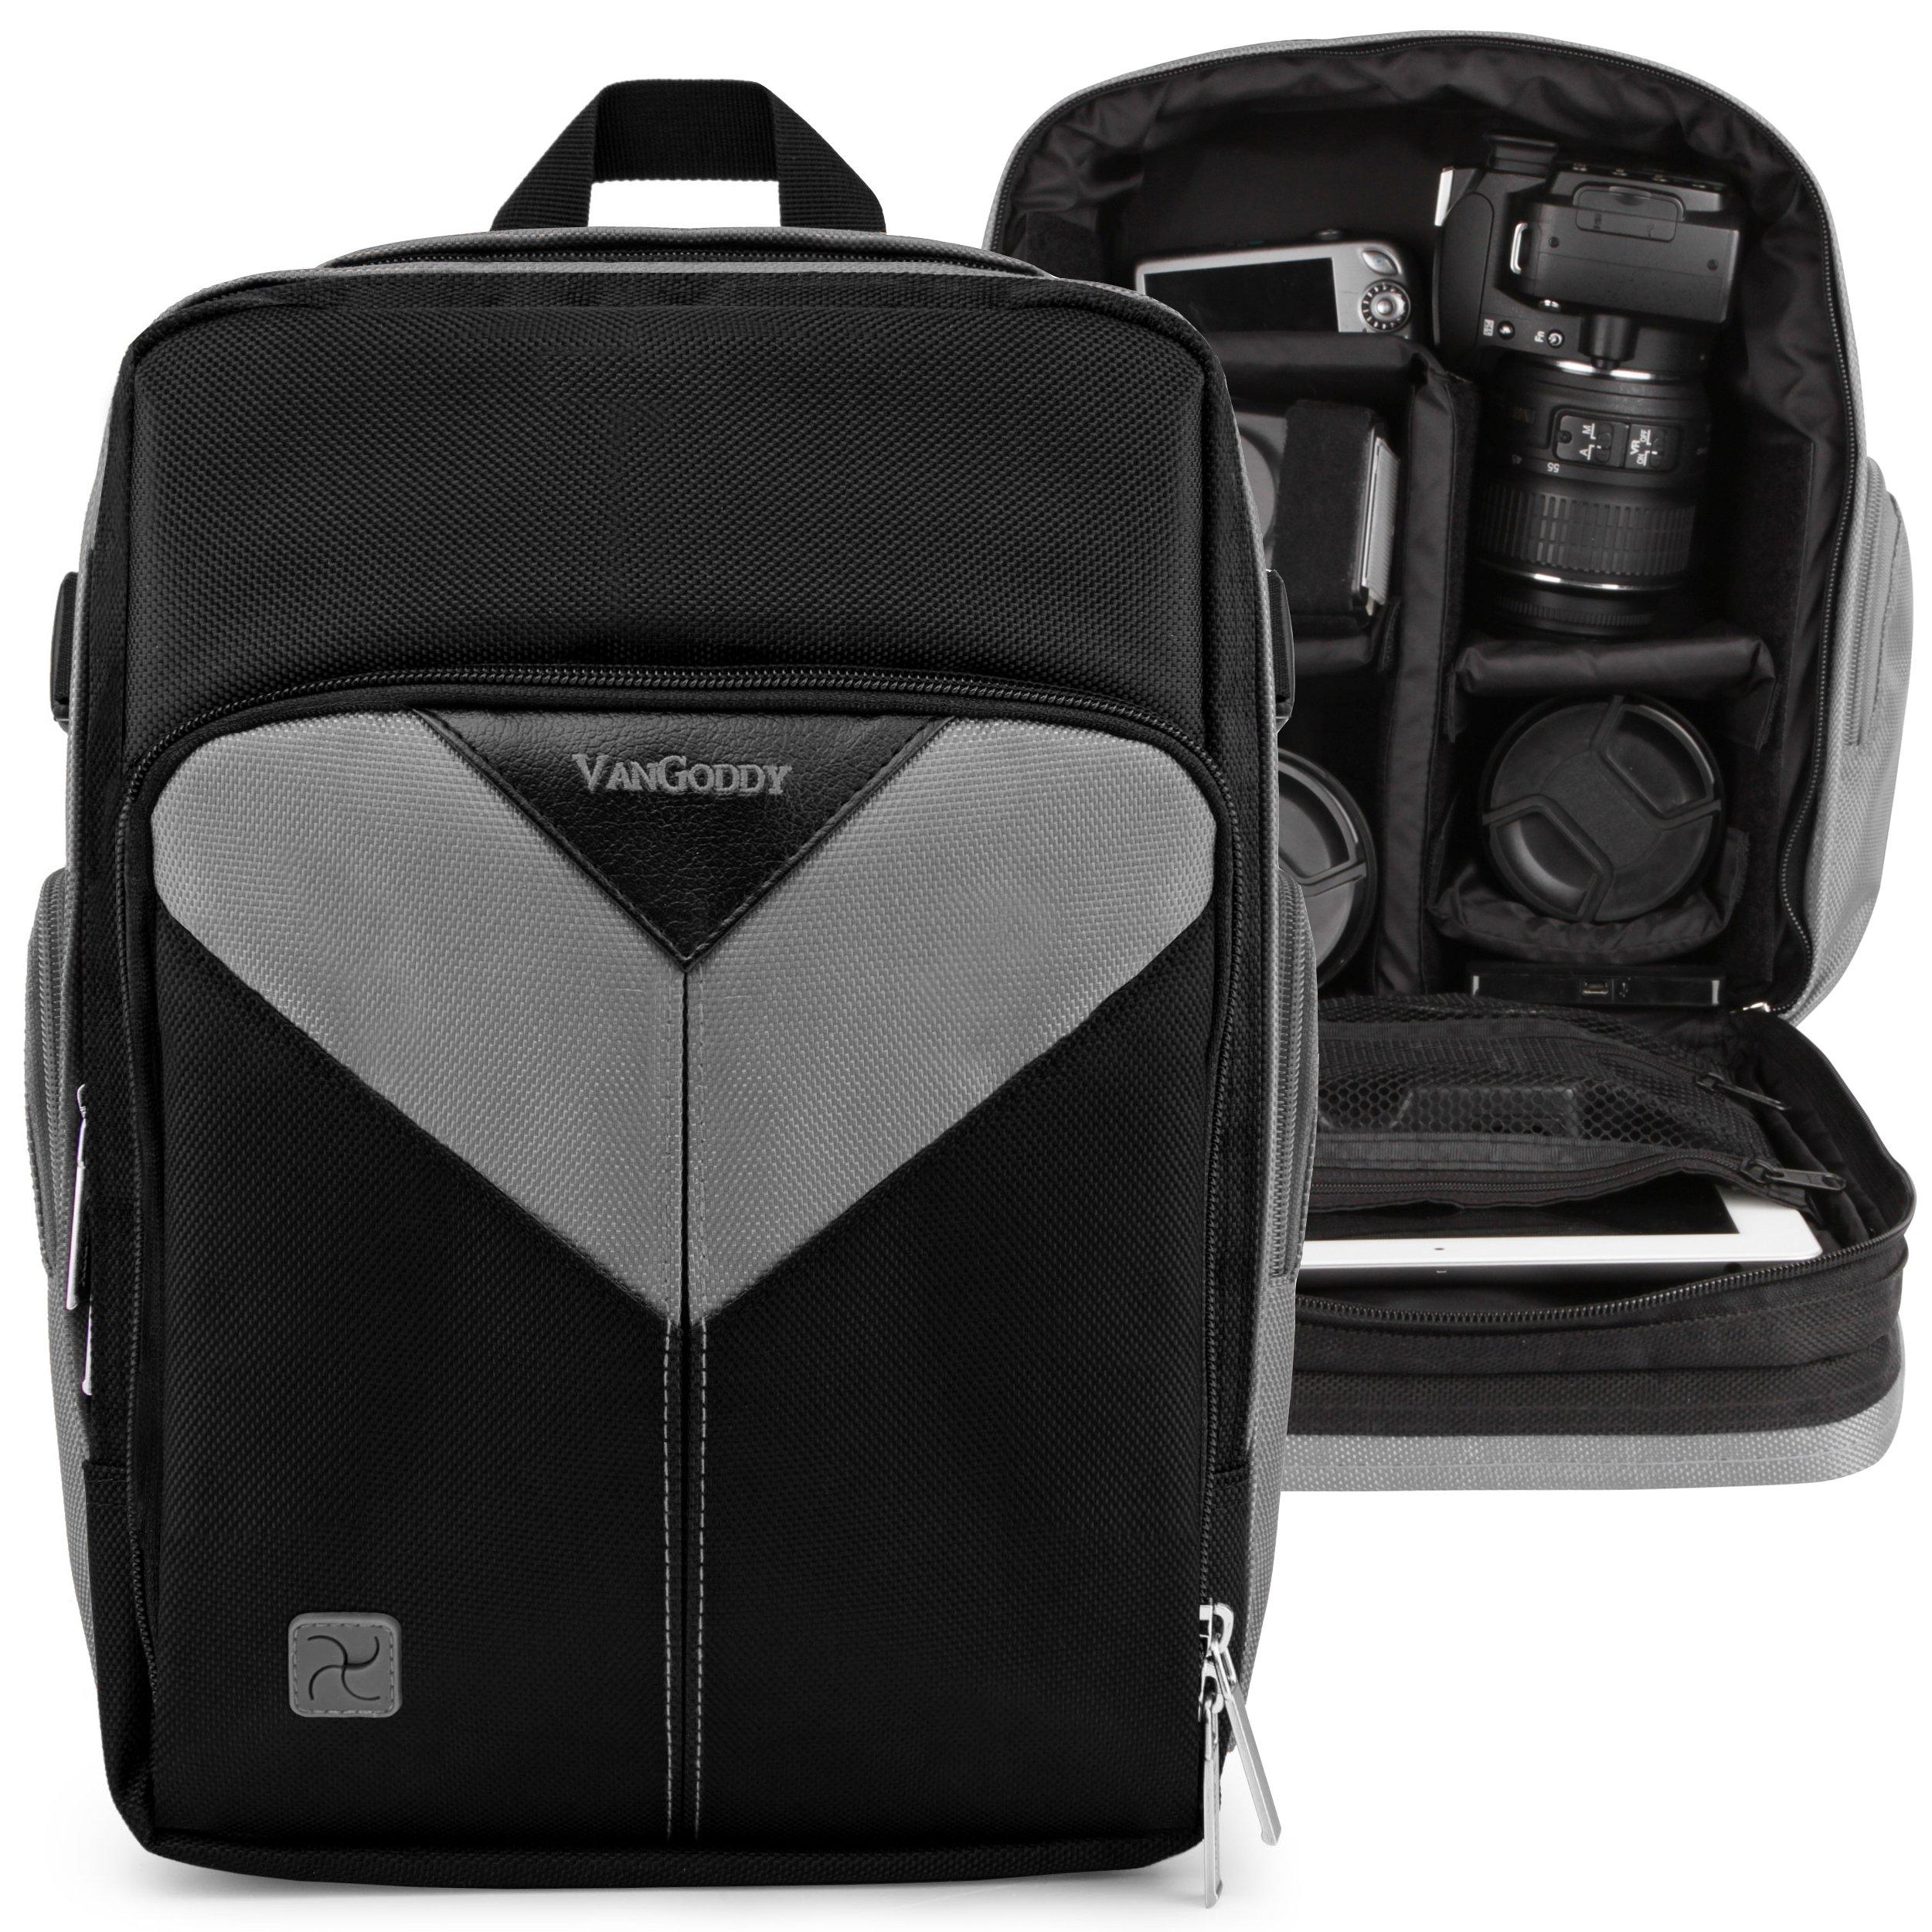 VanGoddy Sparta Ash Gray Camera Backpack Suitable for Canon XA11, XA15, XA10, XA35, XA30, XA20, XC15, XC10, XF400, XF405, XF205, XF200, XF105, XF100, VIXA HF G20, G40, G21, GX10 by Vangoddy